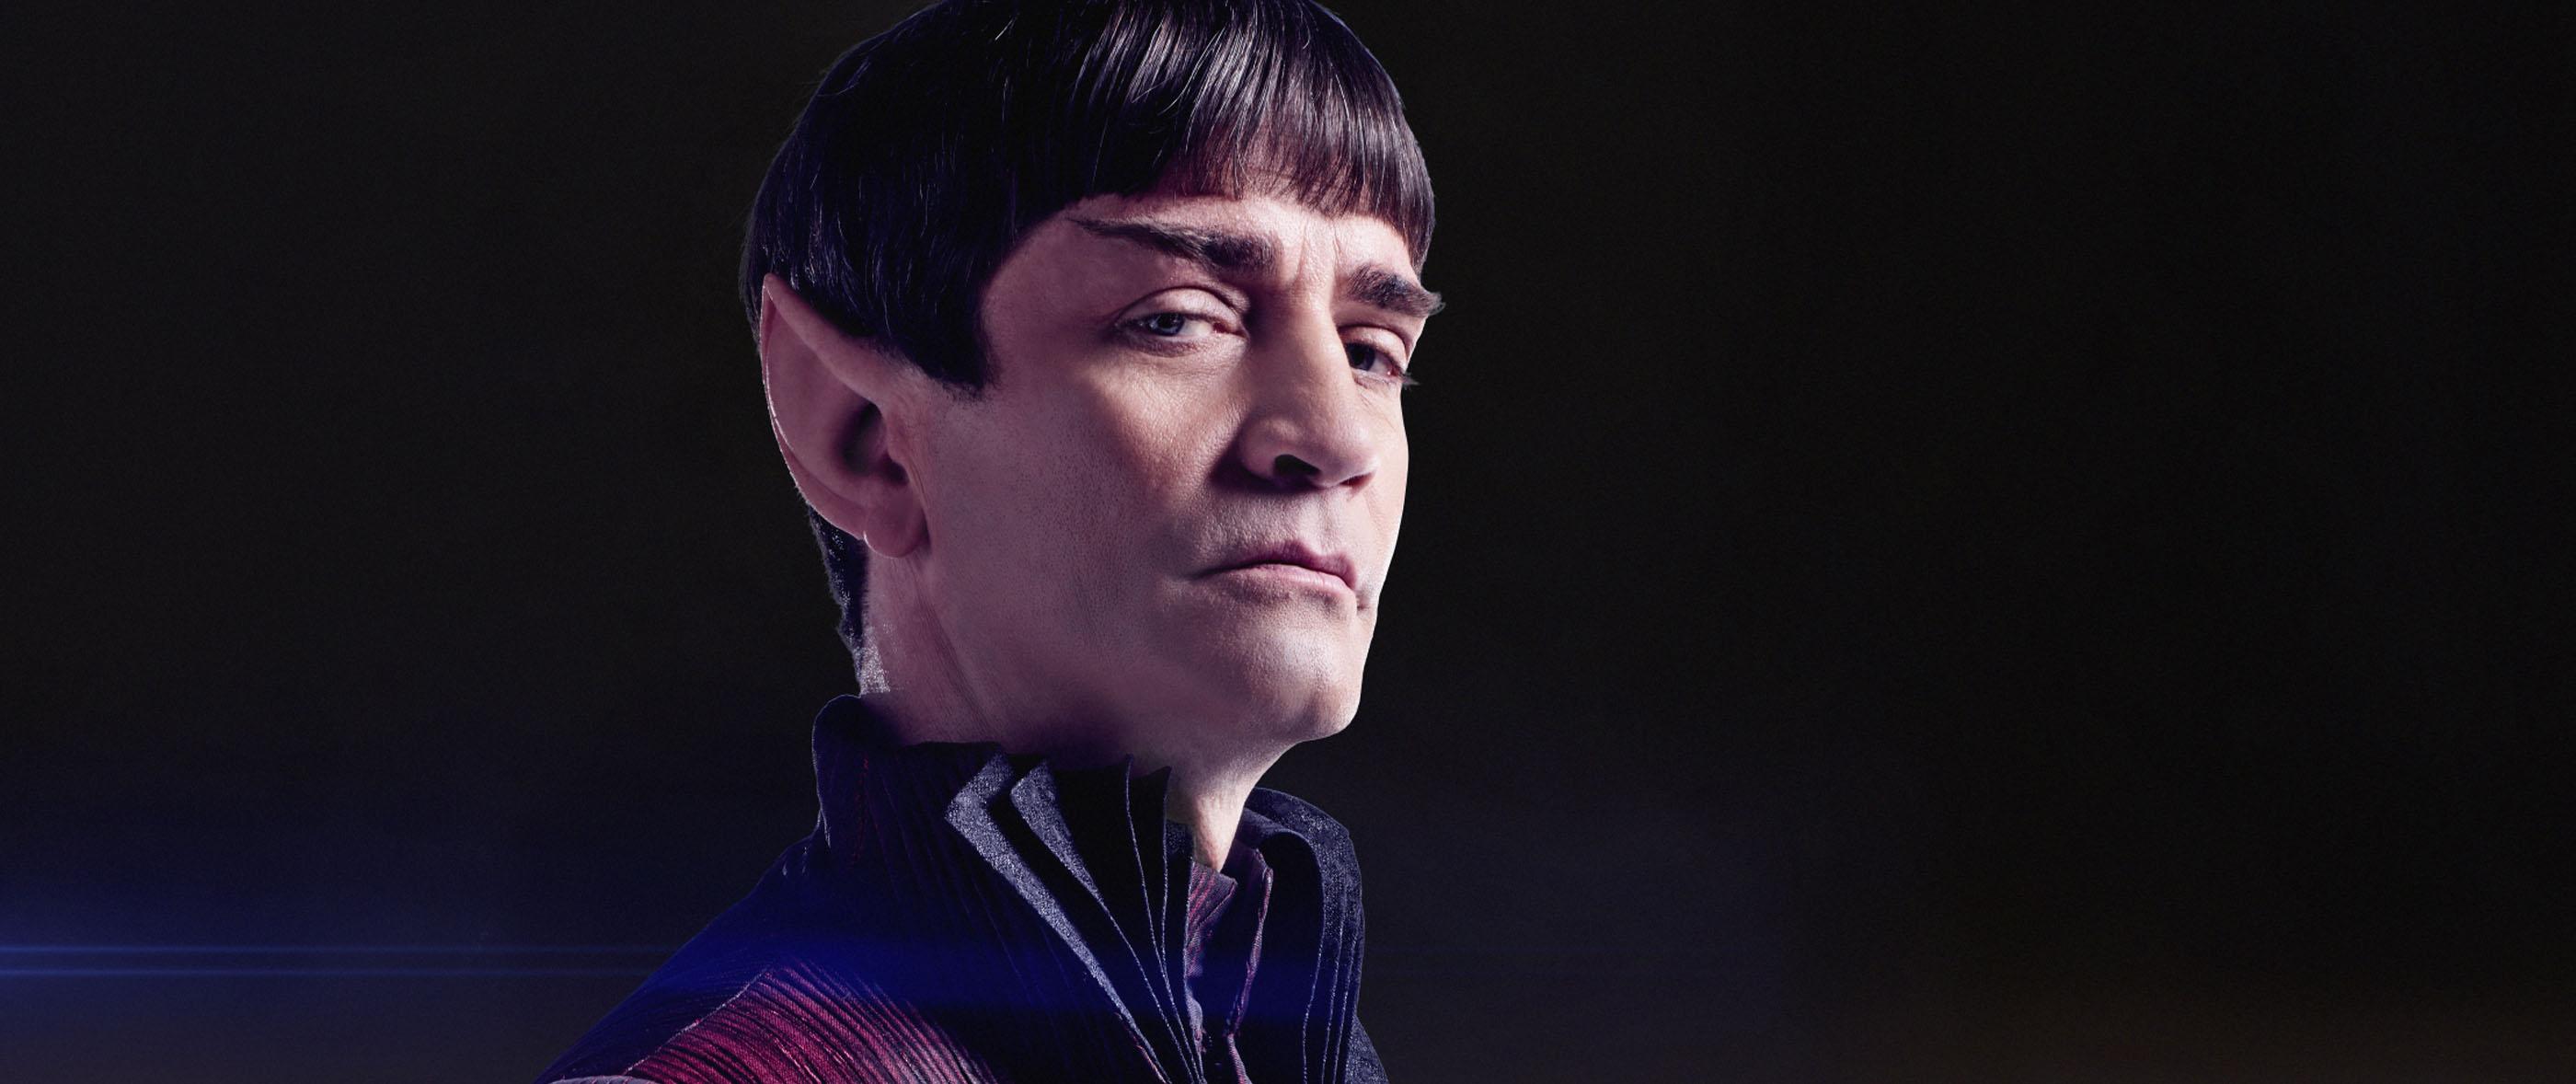 Star Trek Discovery Episode 6 Lethe Multiversalbeta